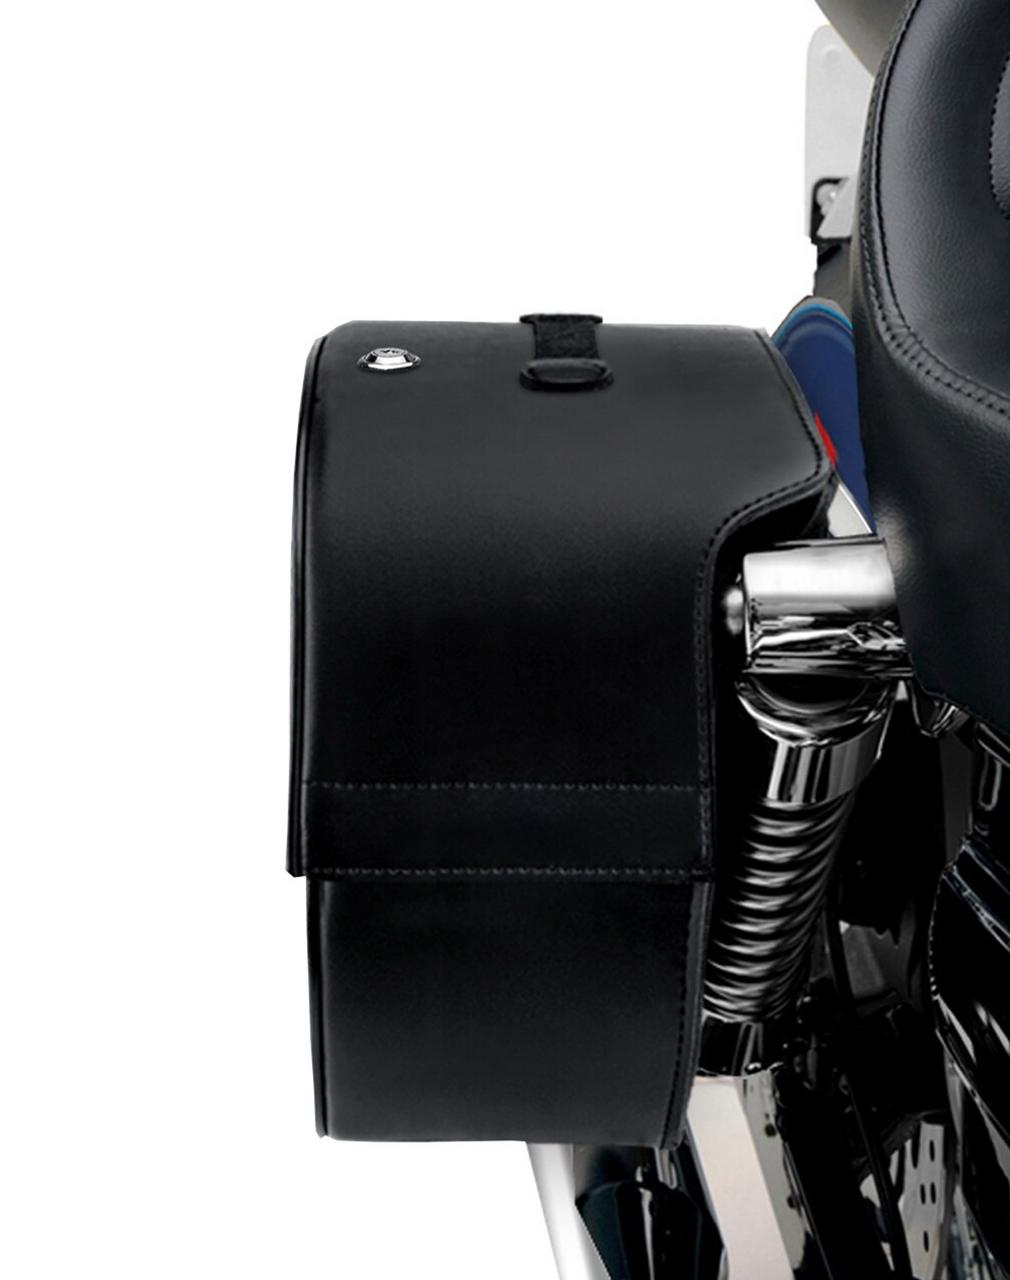 Honda CMX 250C Rebel 250 Armor Shock Cutout Motorcycle Saddlebags Shock Cutout View